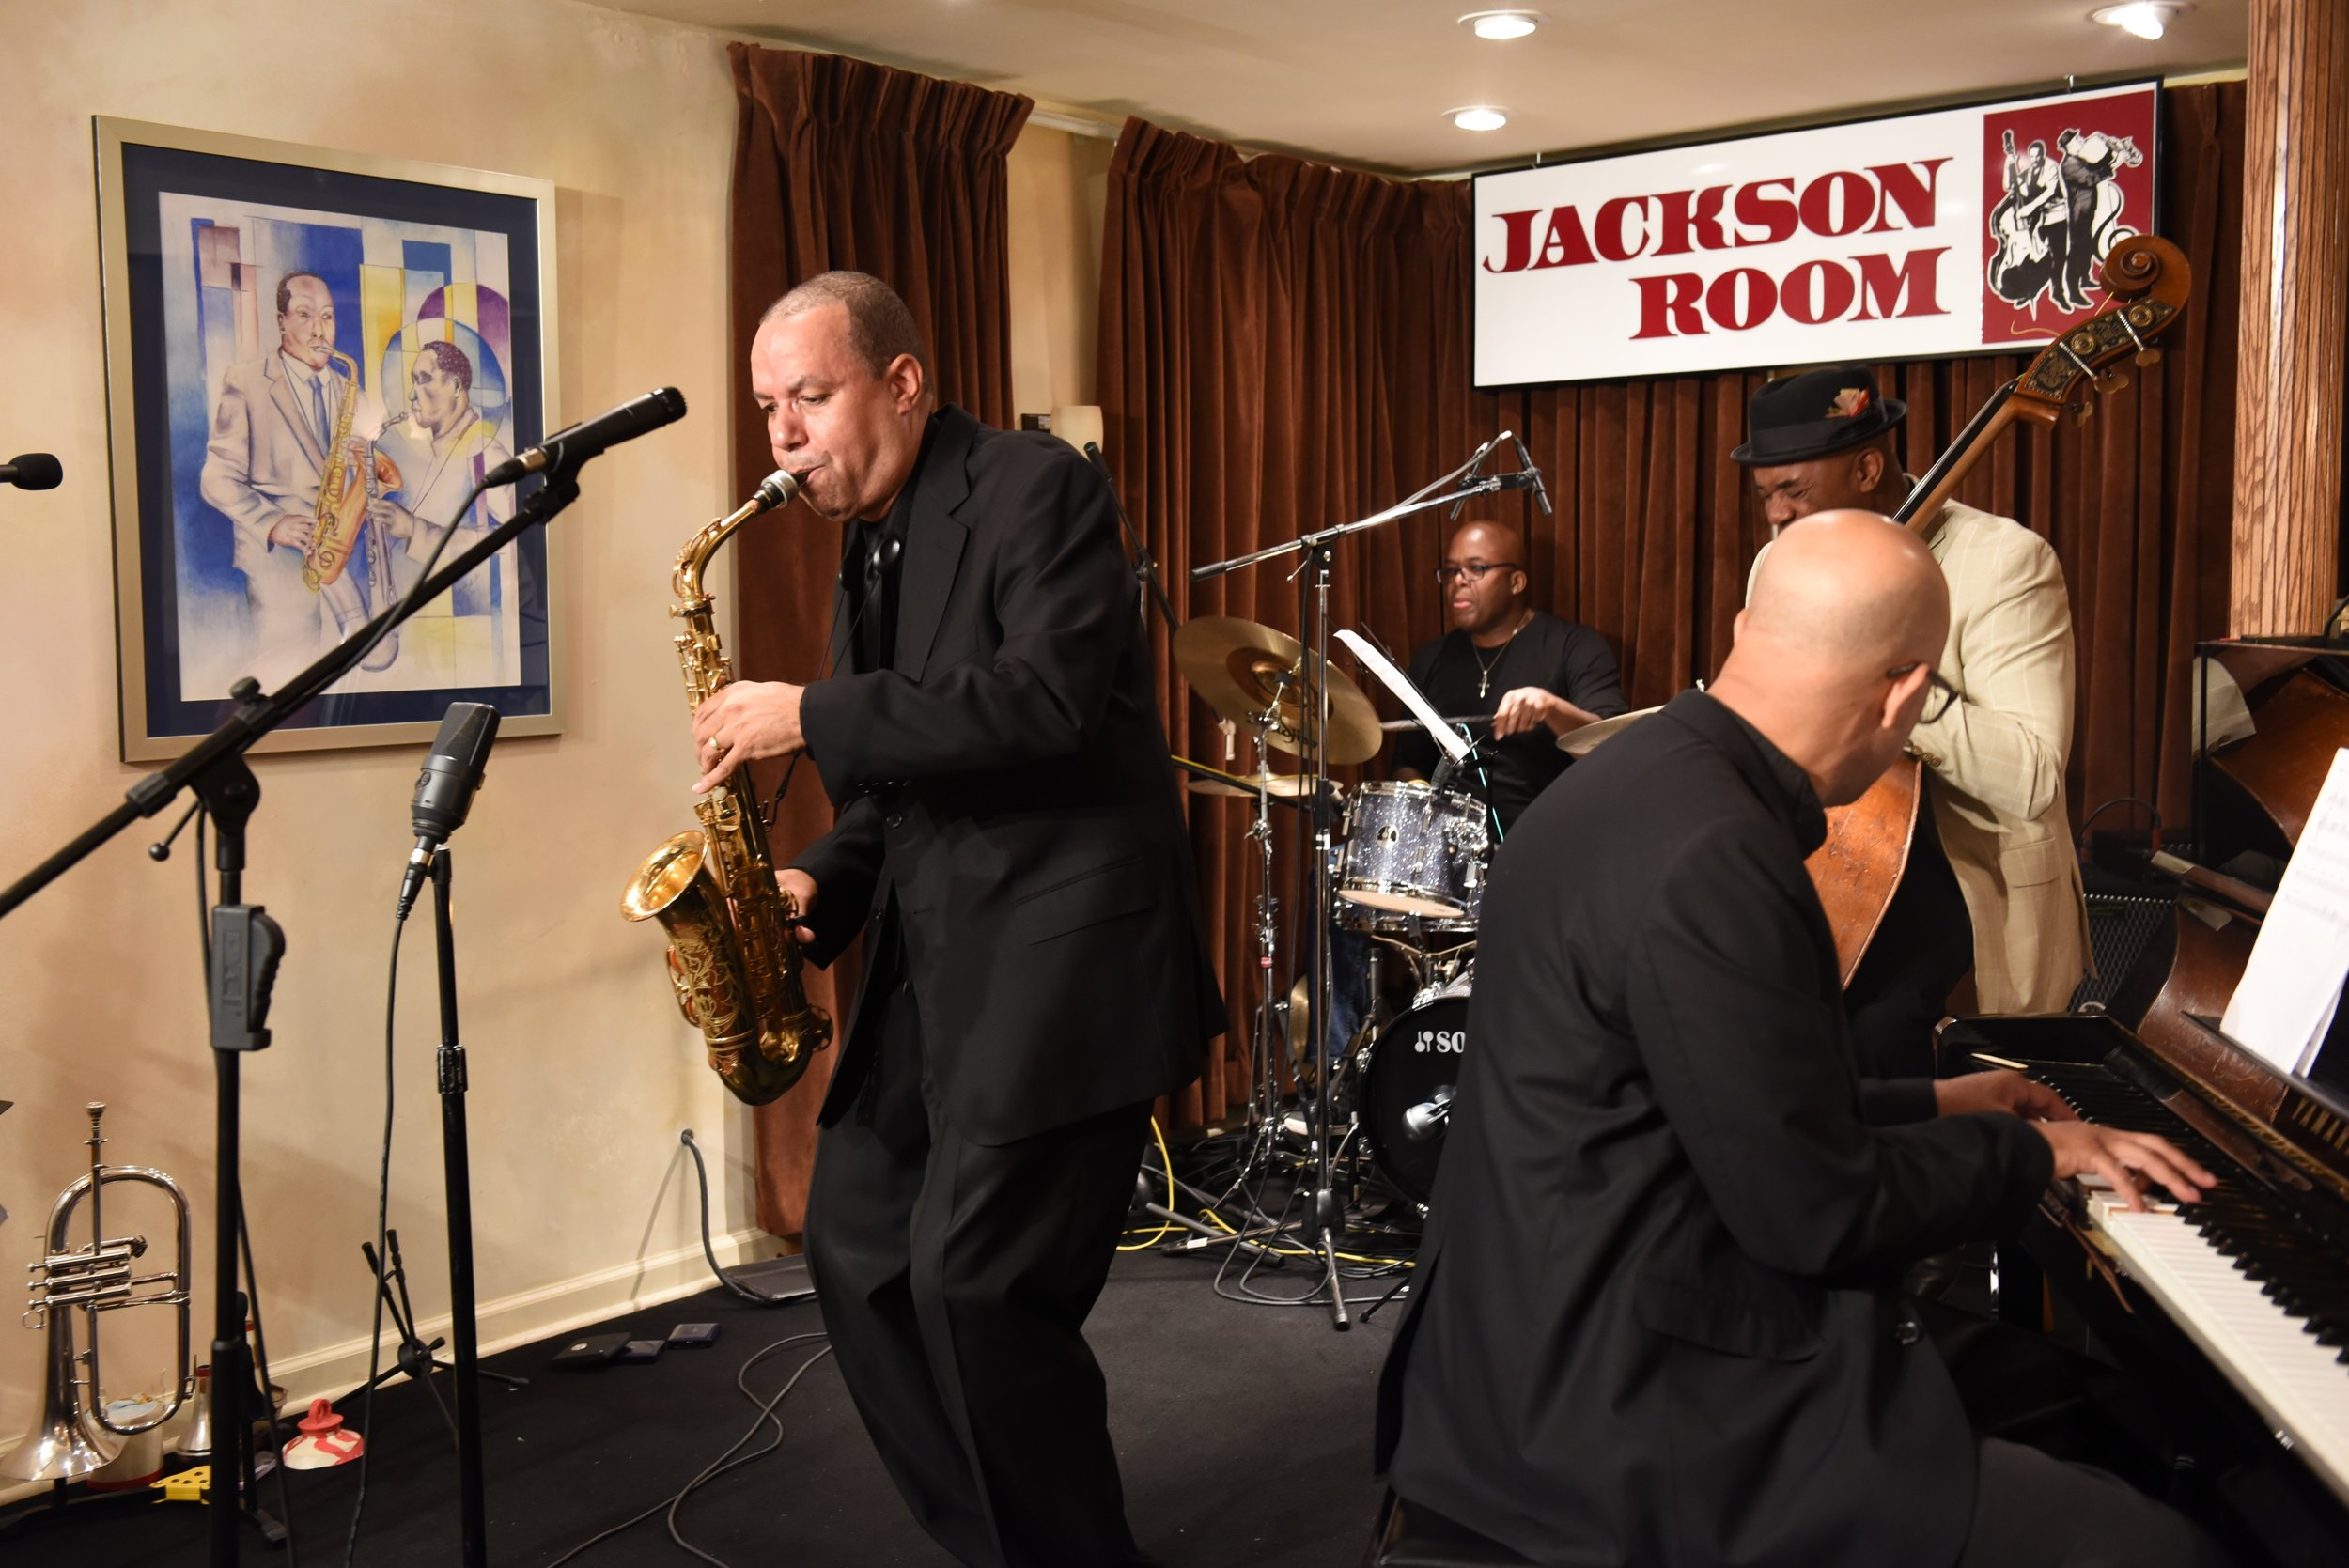 Jackson Room Live Recording_a_9-26-2015 (383).jpg